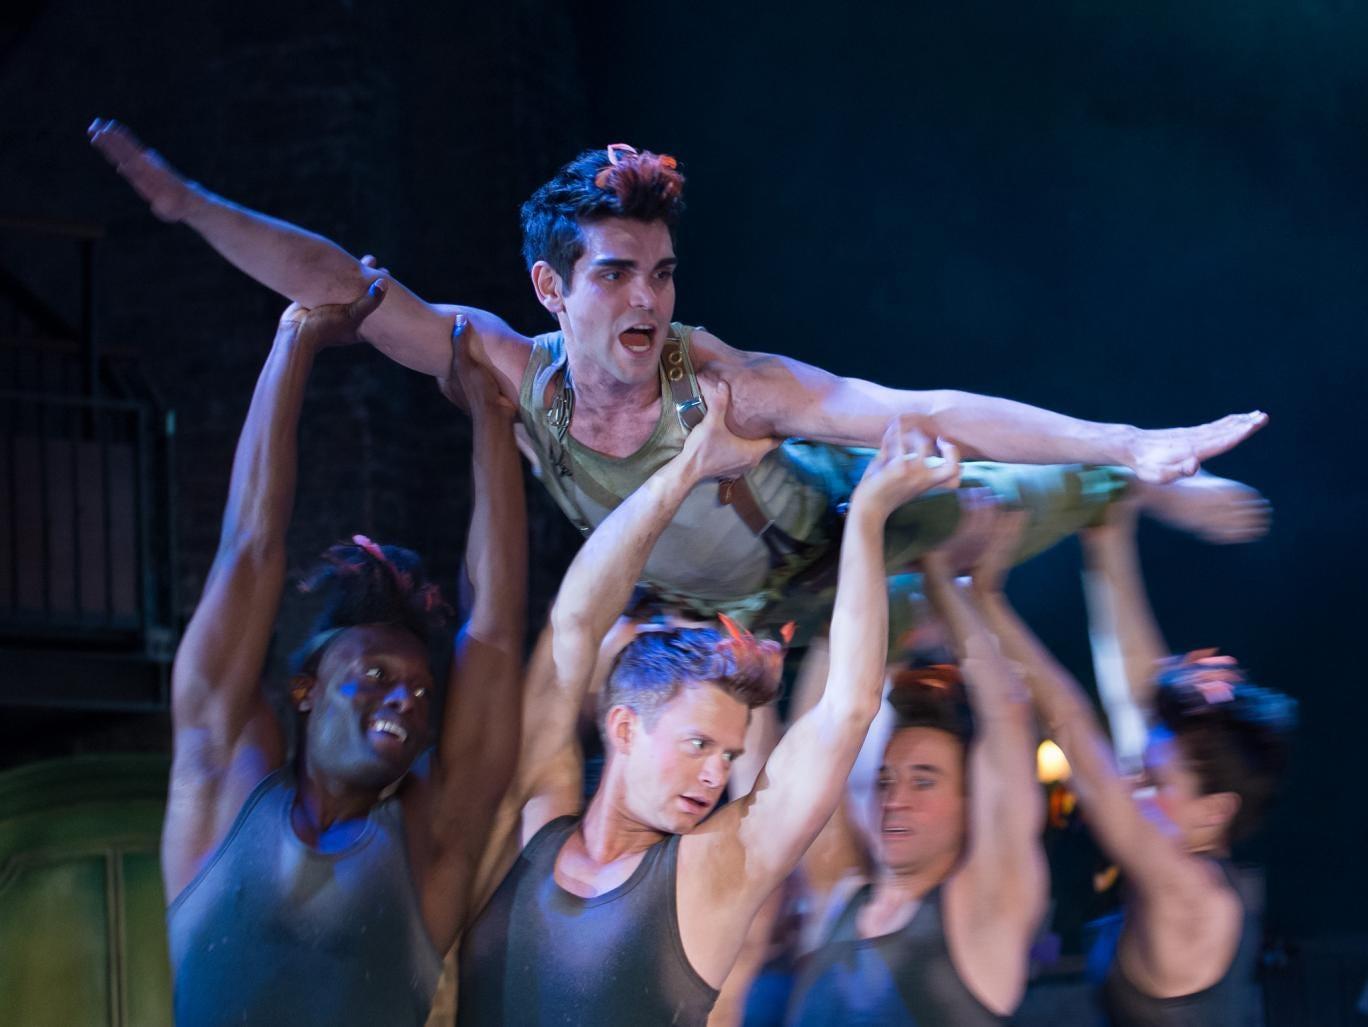 Sam Swann as Peter Pan, held by the Shadows